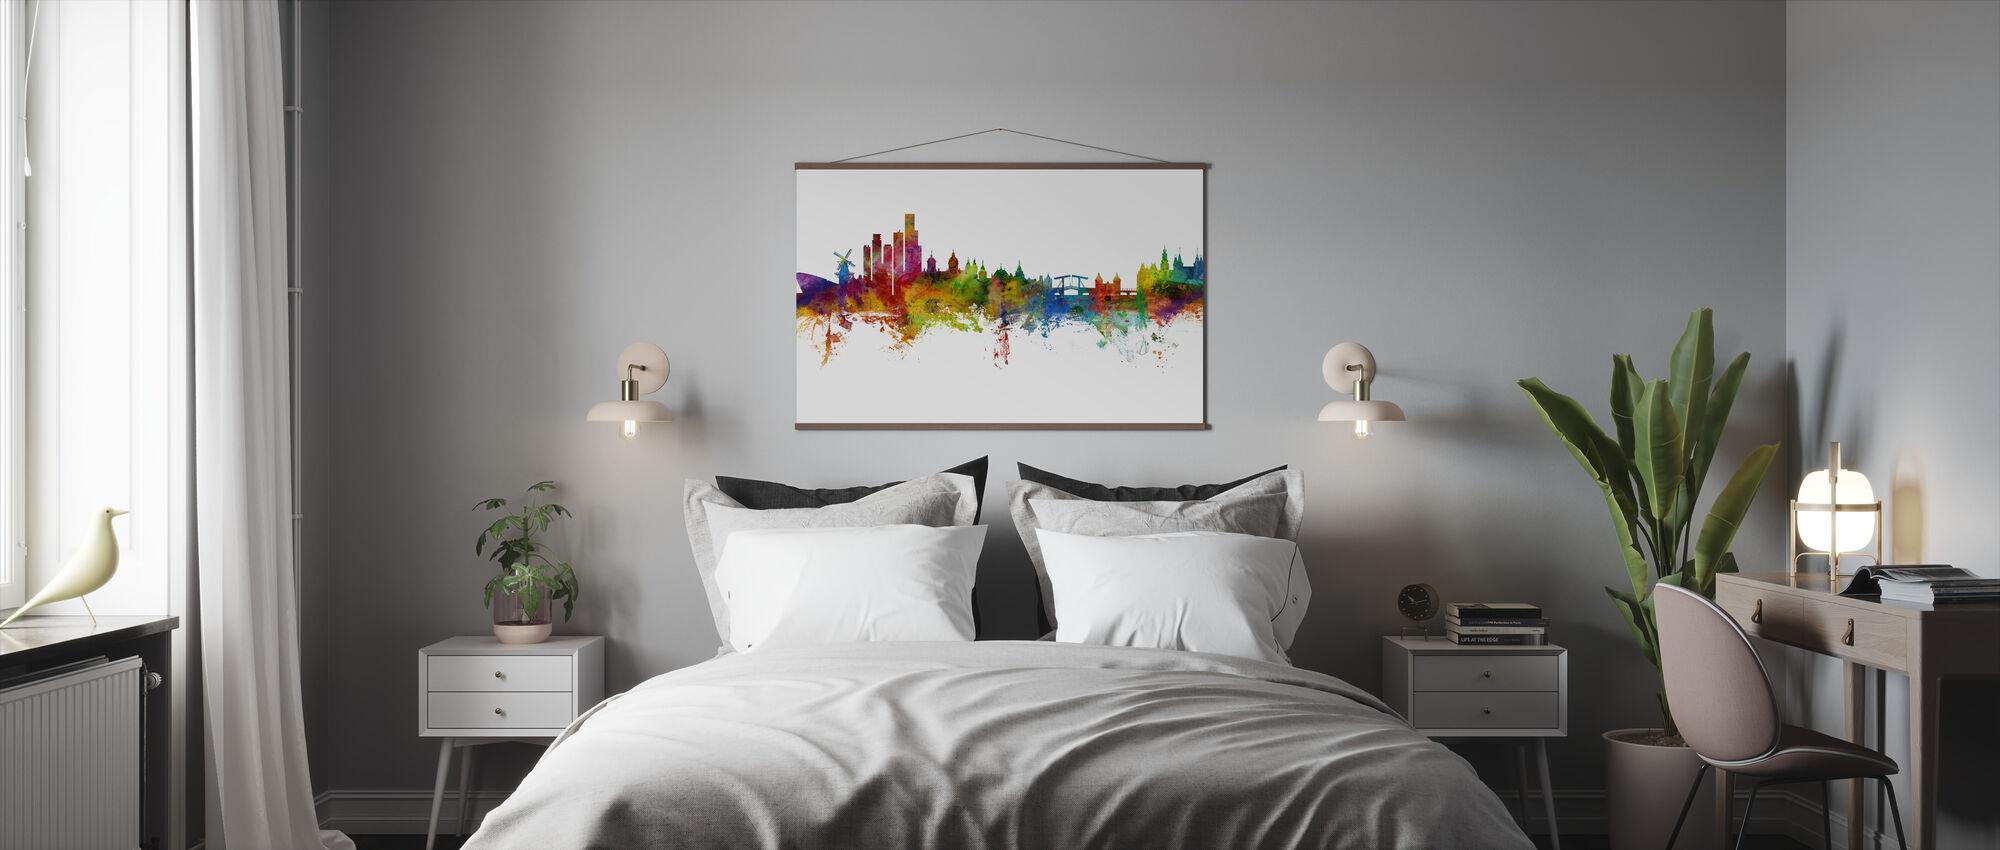 Amsterdam Skyline windmill - Poster - Bedroom